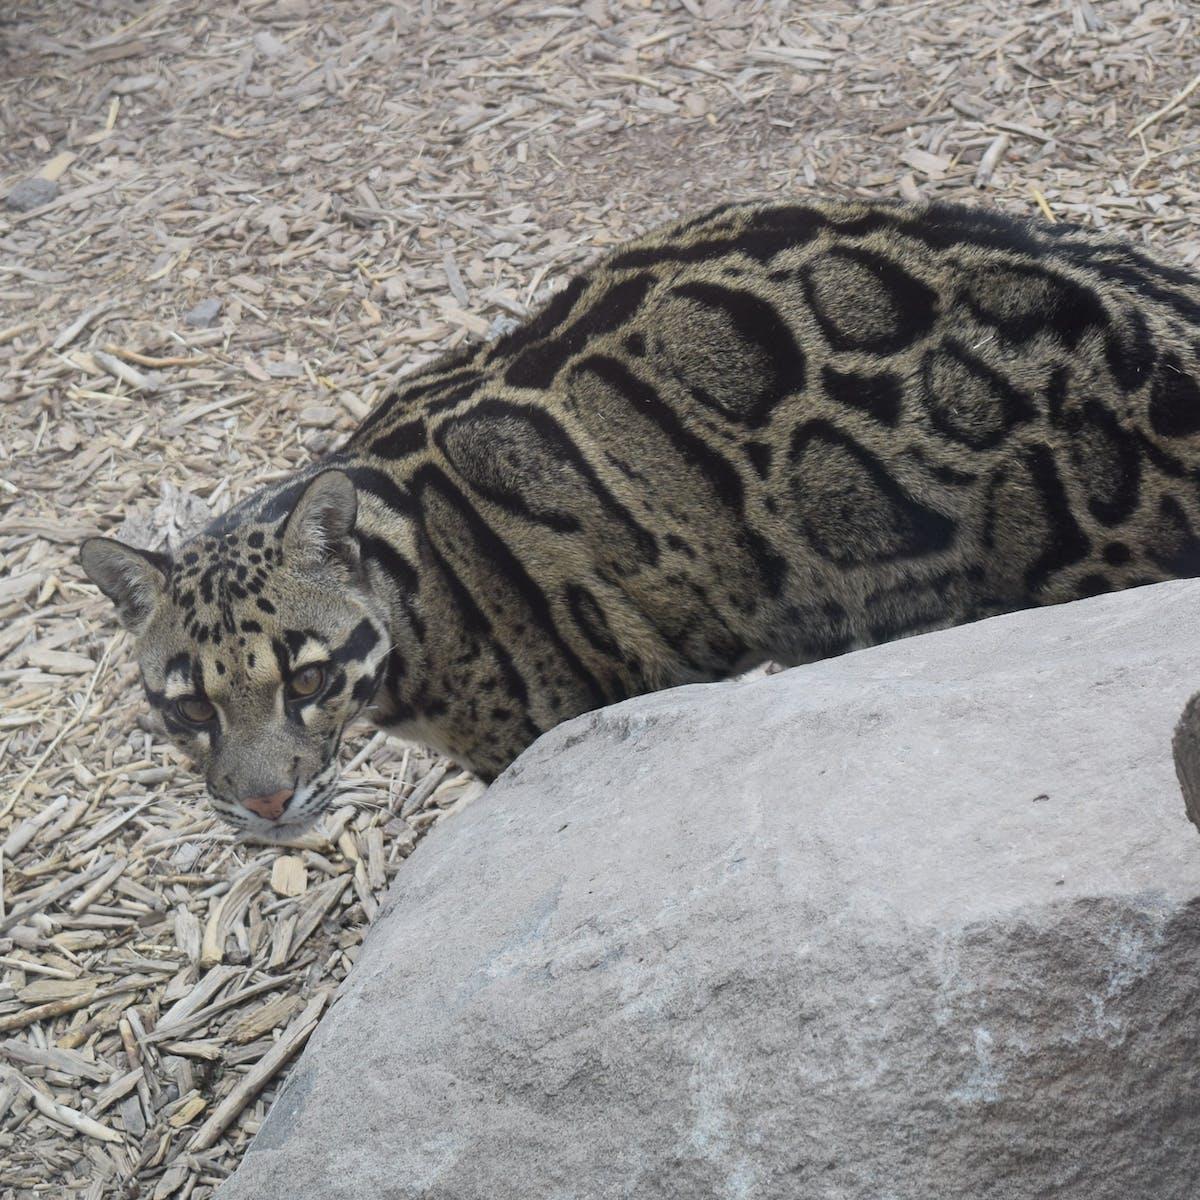 clouded leopard behind rock